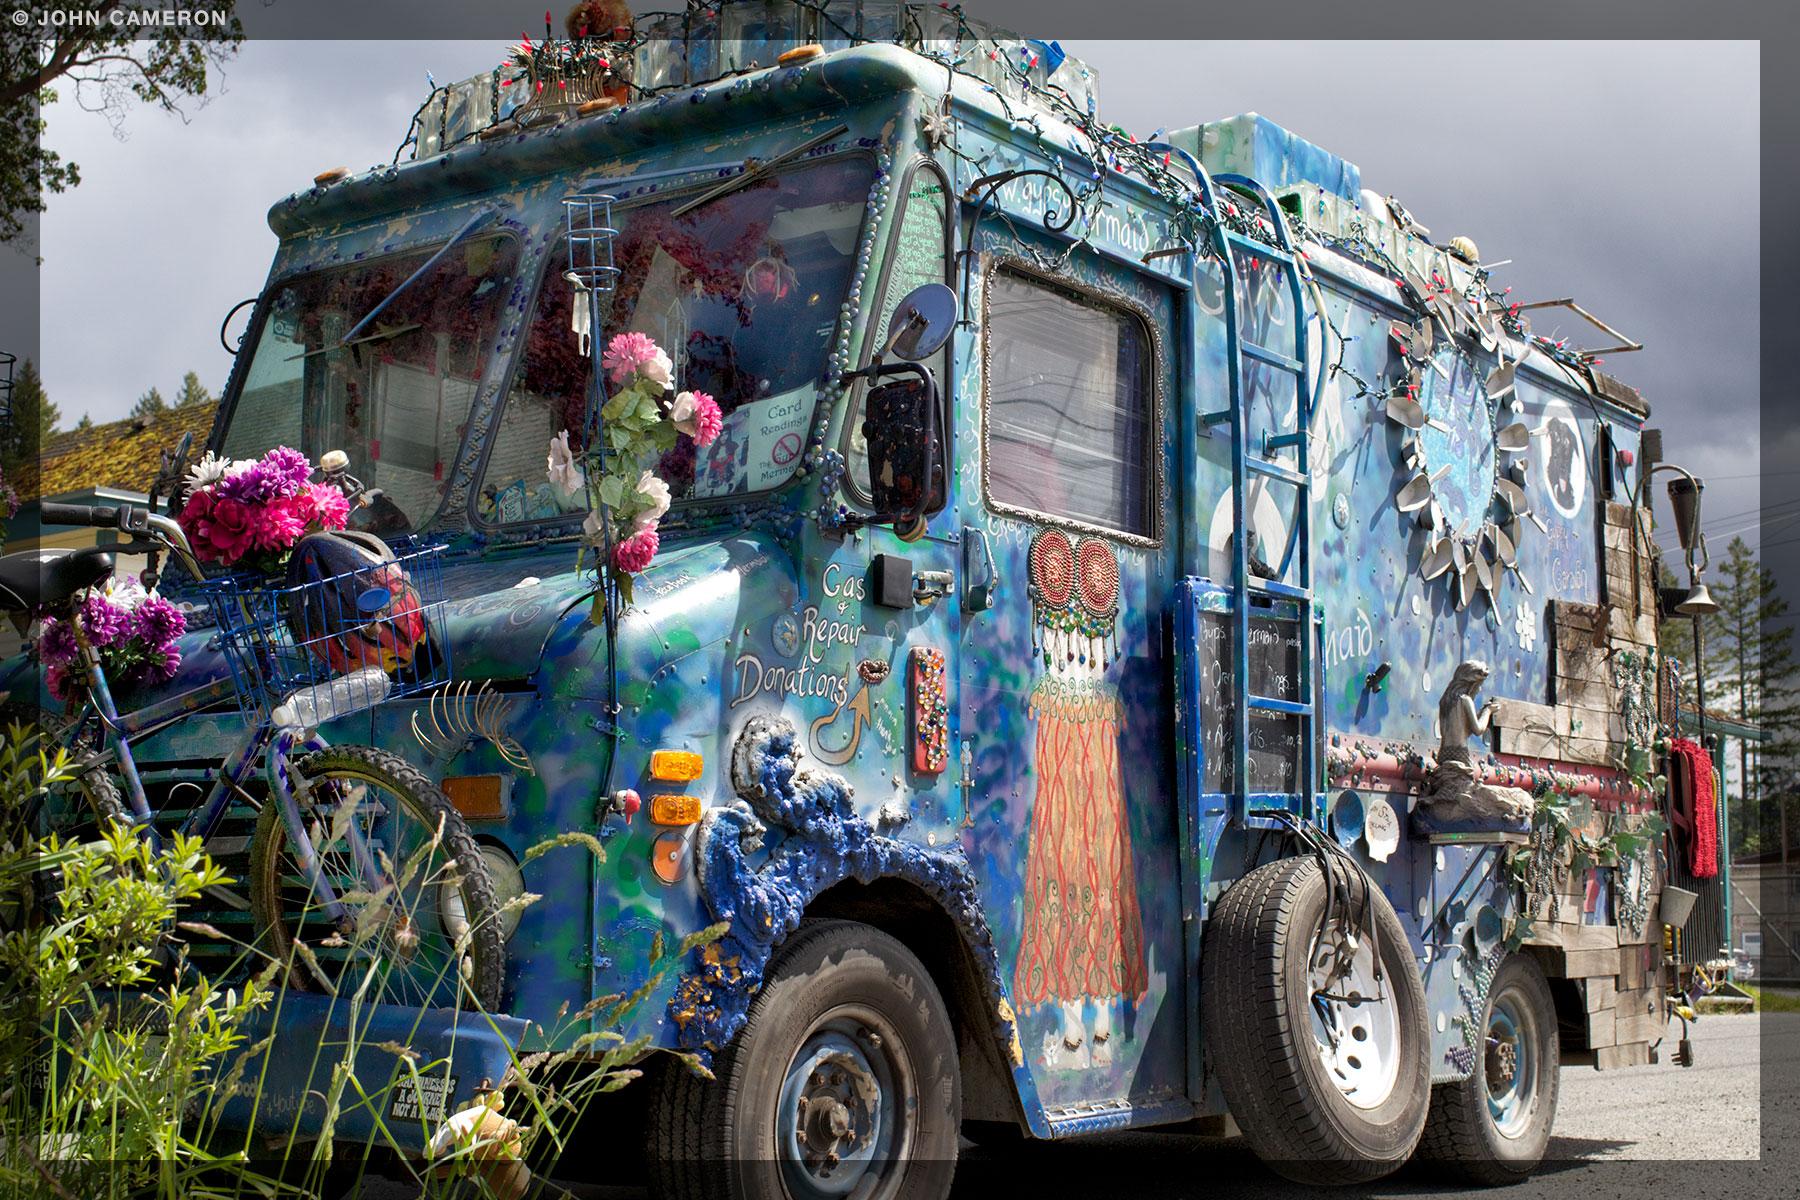 Van on Salt Spring Island